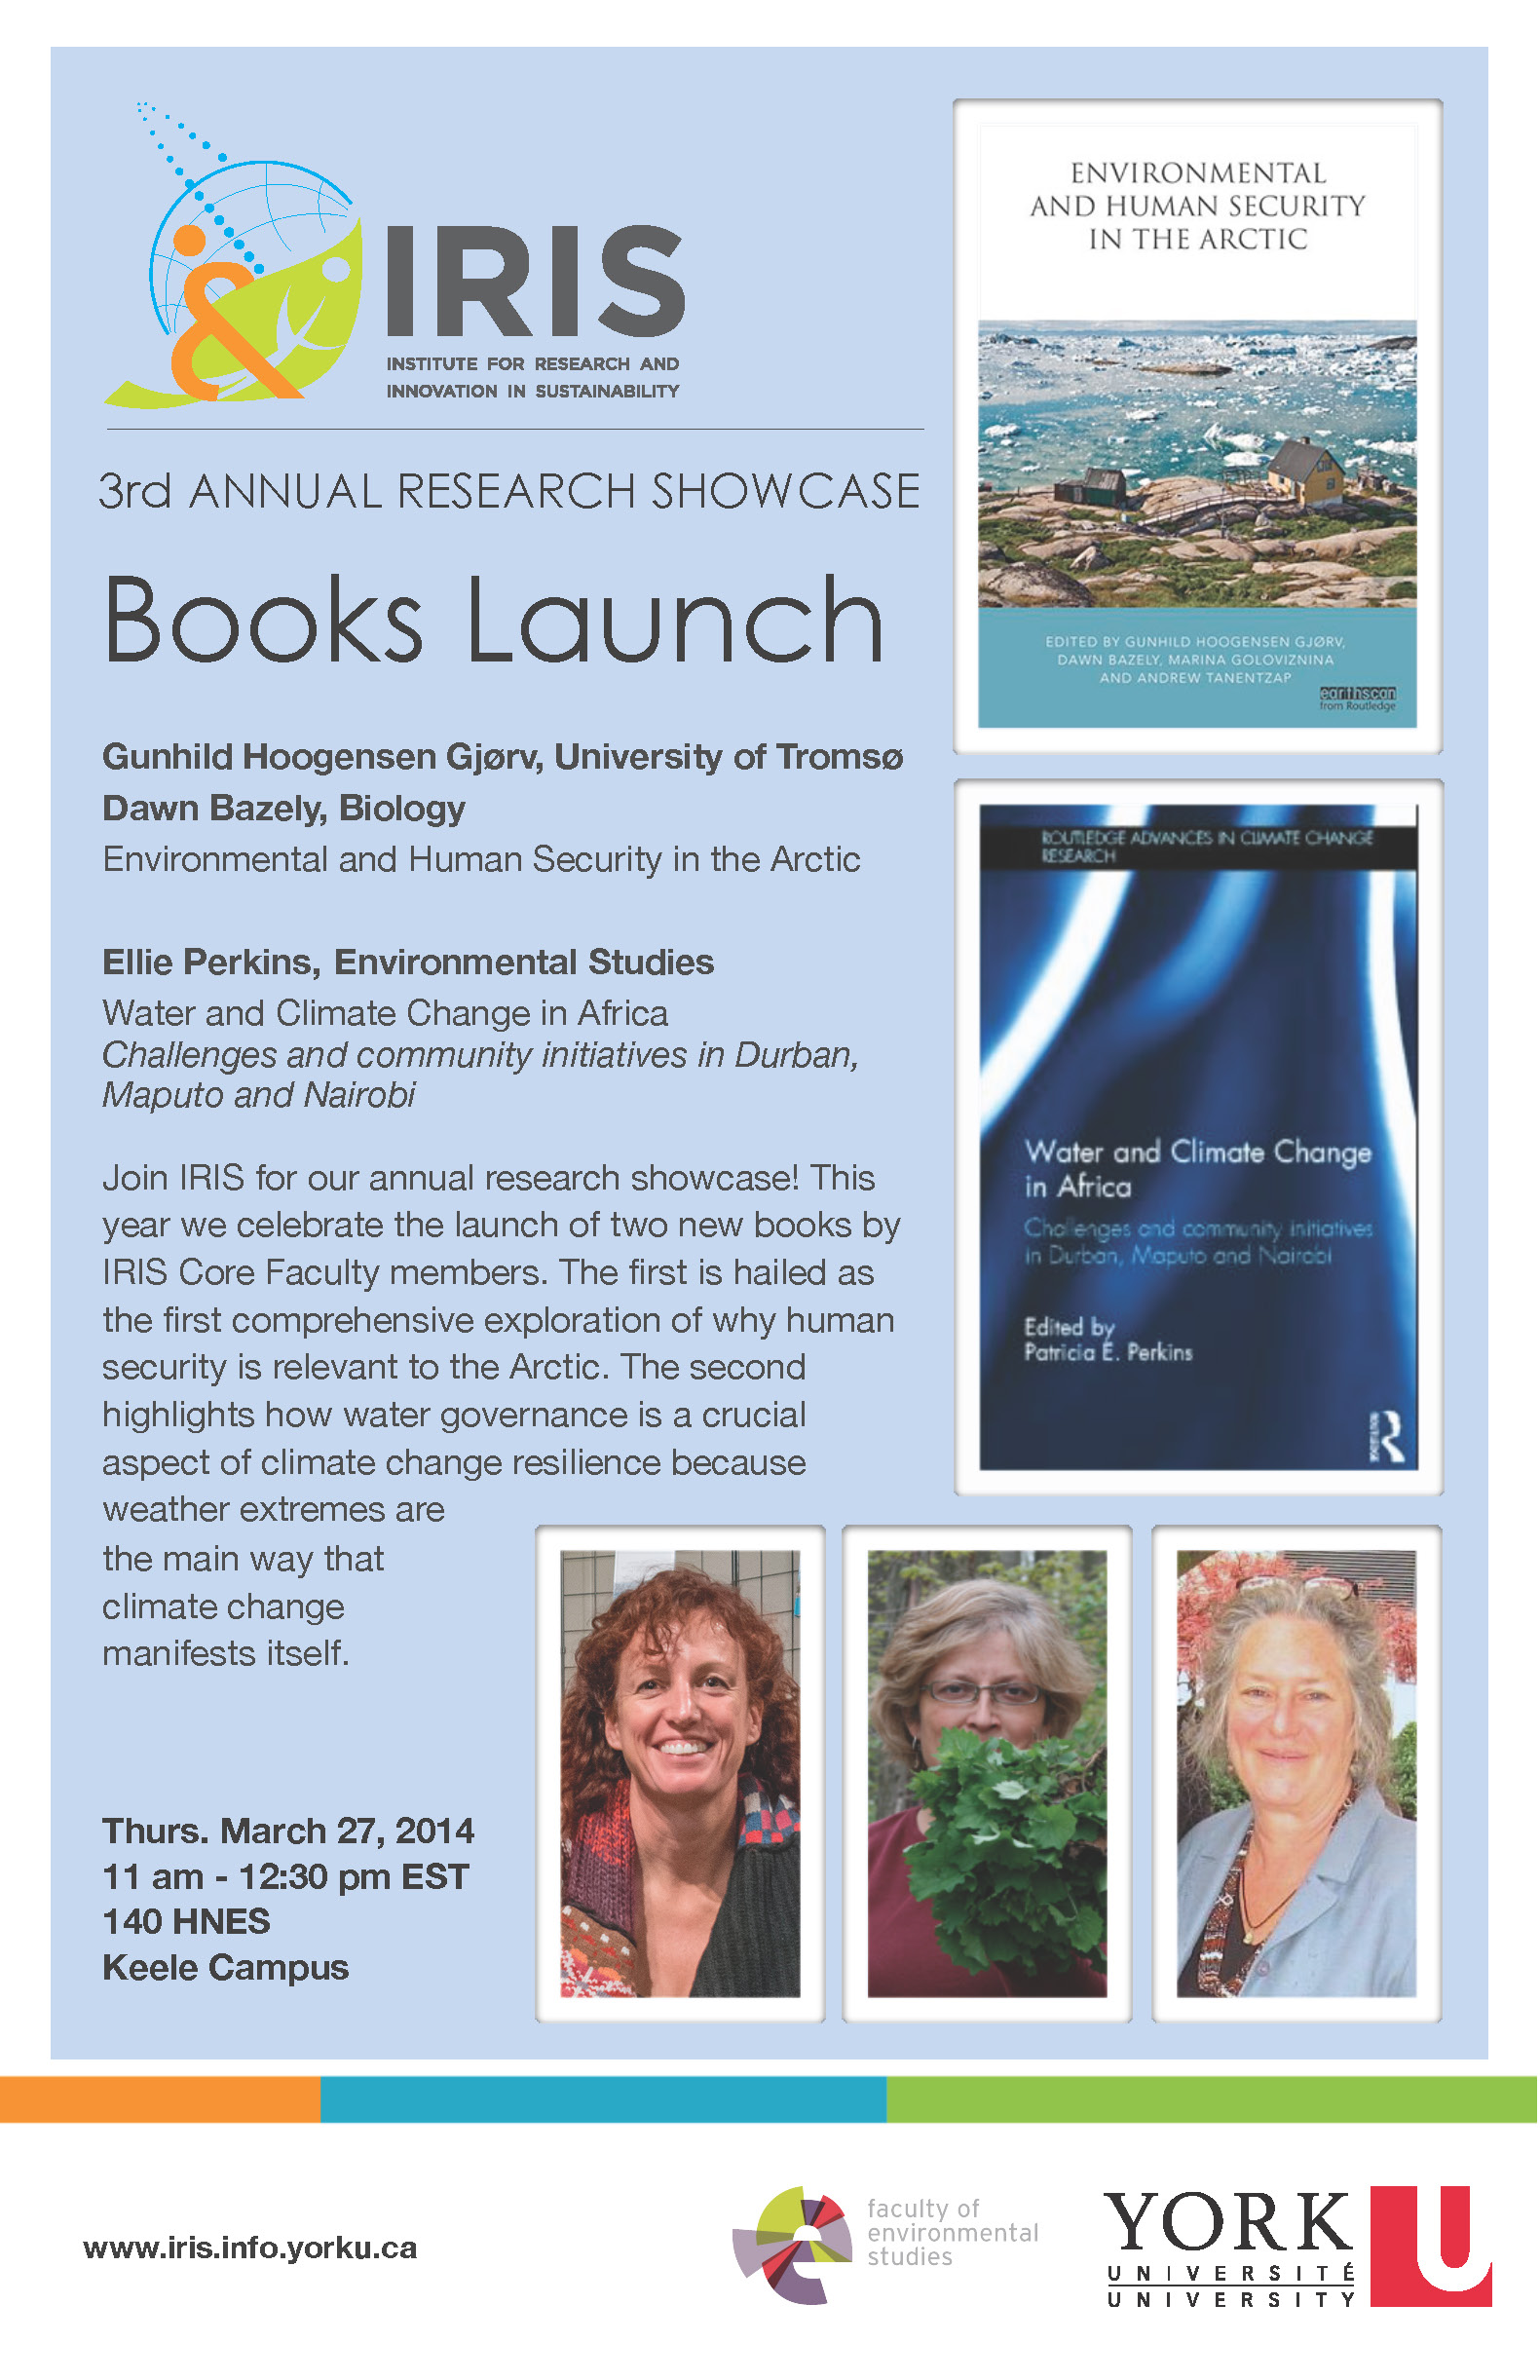 IRIS Showcase - 2014 - Book Launches